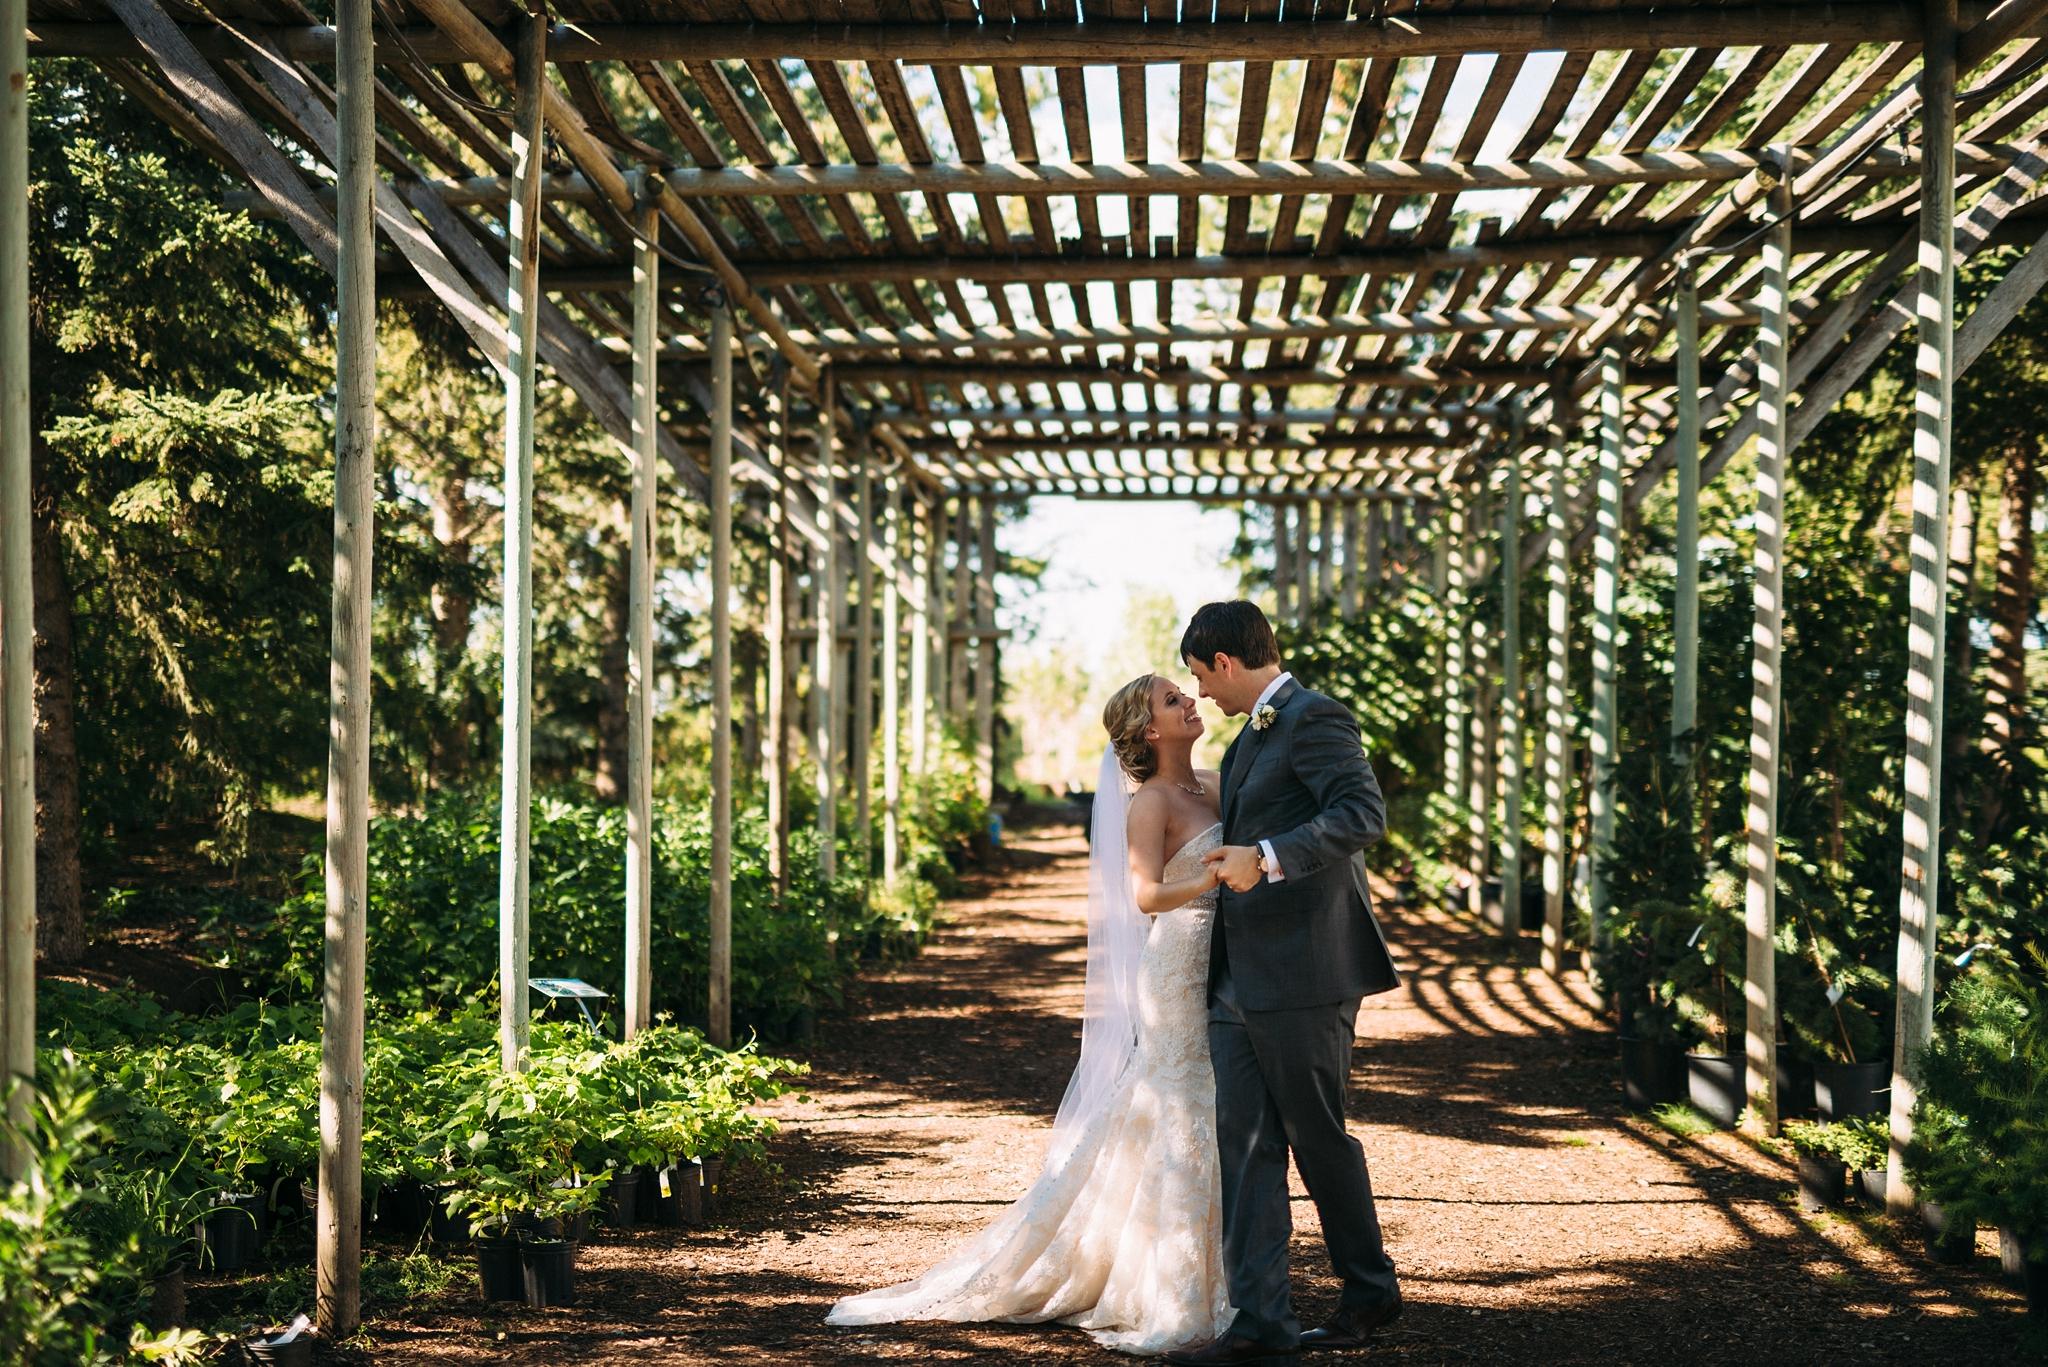 kaihla_tonai_intimate_wedding_elopement_photographer_4342